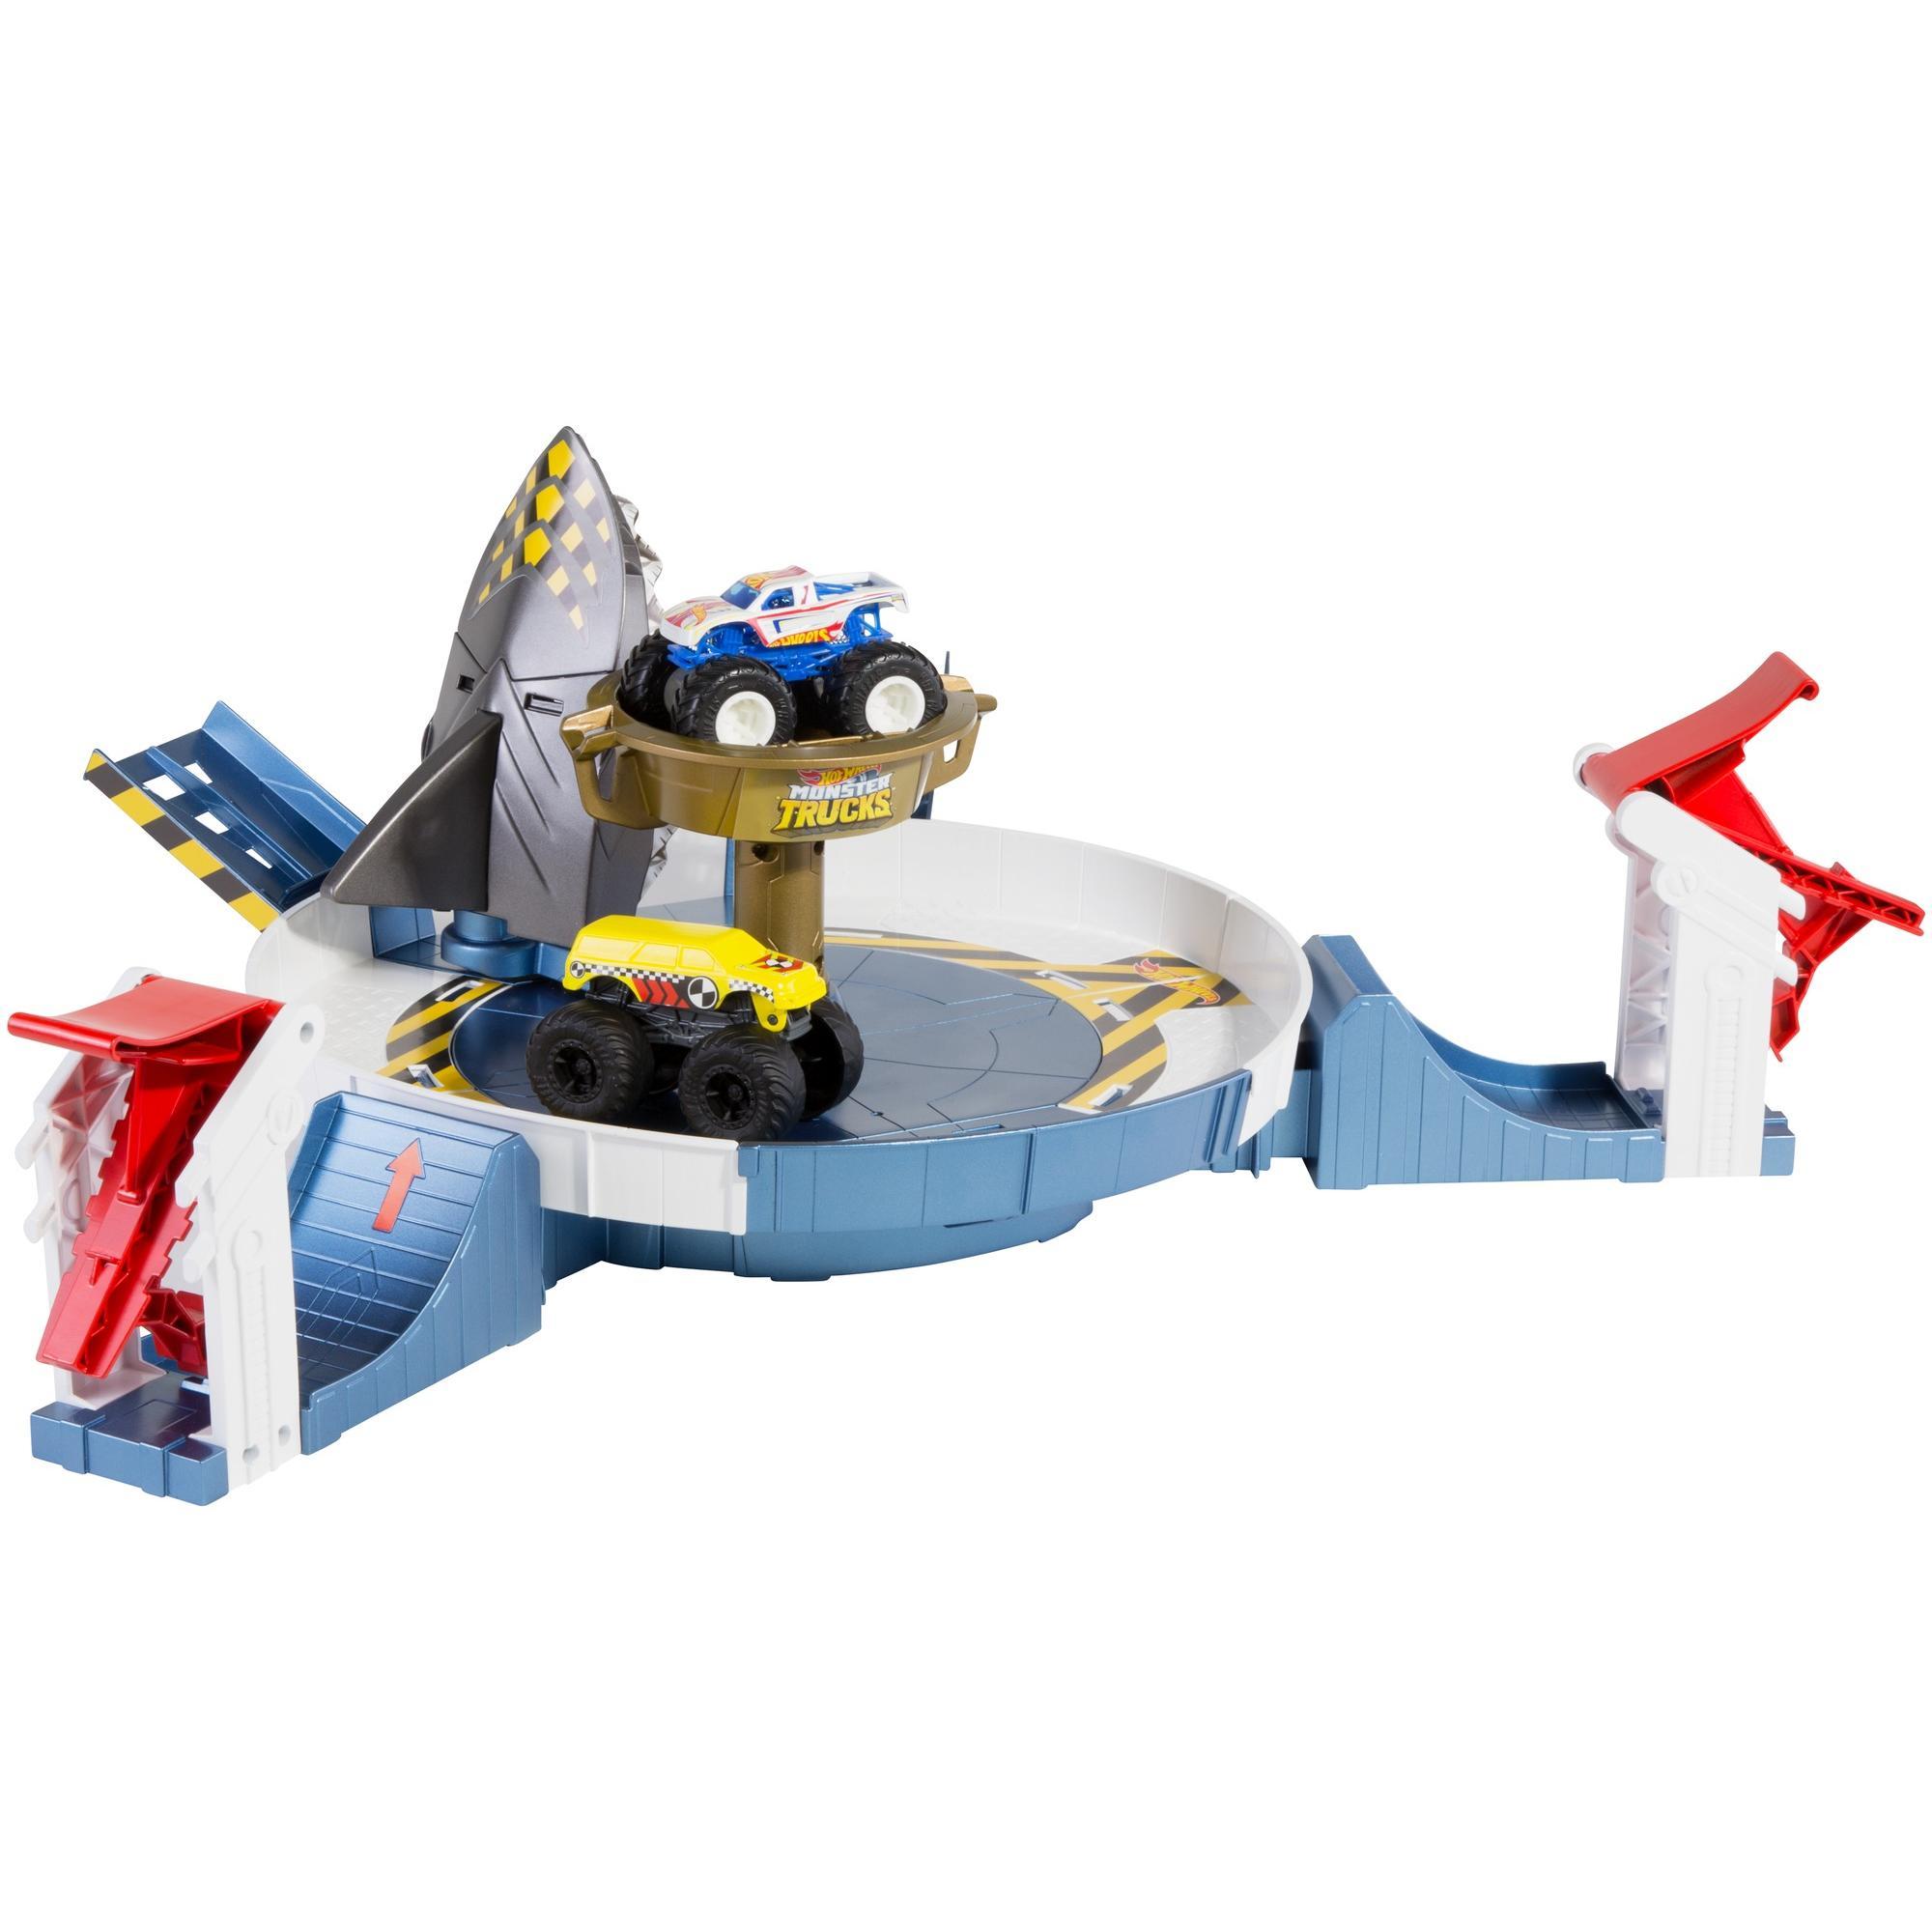 Walmart: Hot Wheels City Bat Manor Attack Playset $7.44, Disney Pixar Cars Crash Derby Playset $16.90 & More + Free Store Pick-Up